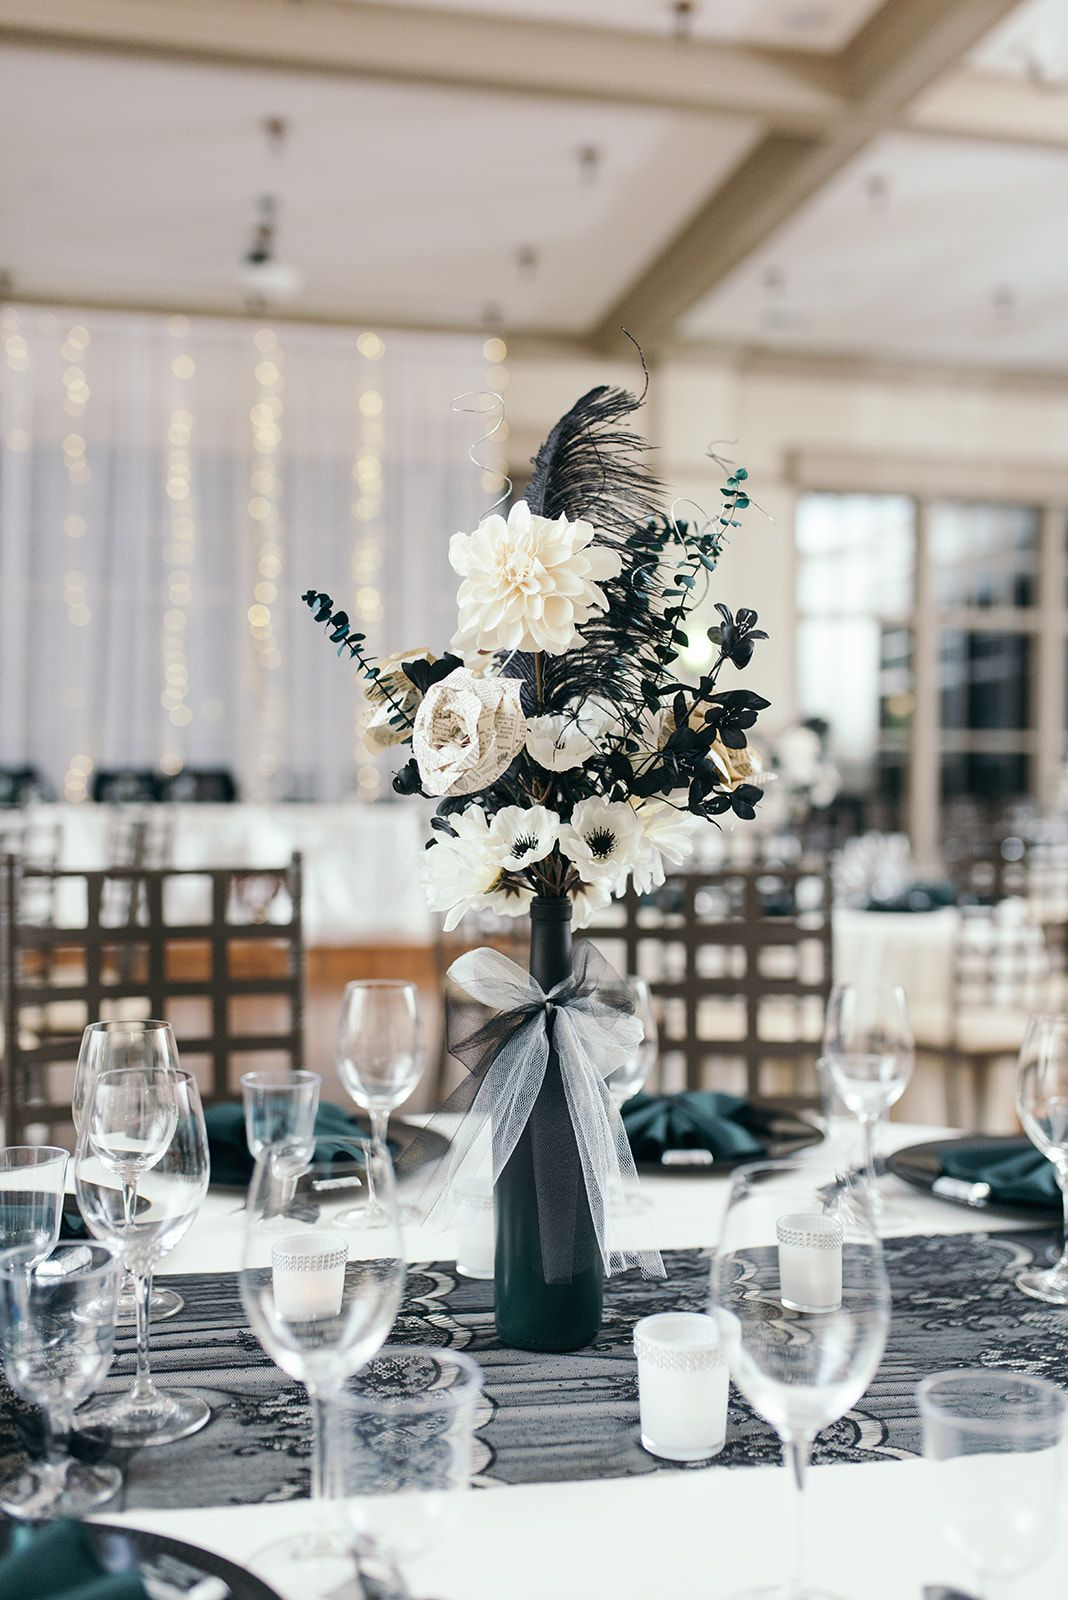 An Eclectic, Vintage Wedding at NOAH'S Event Venue in Des